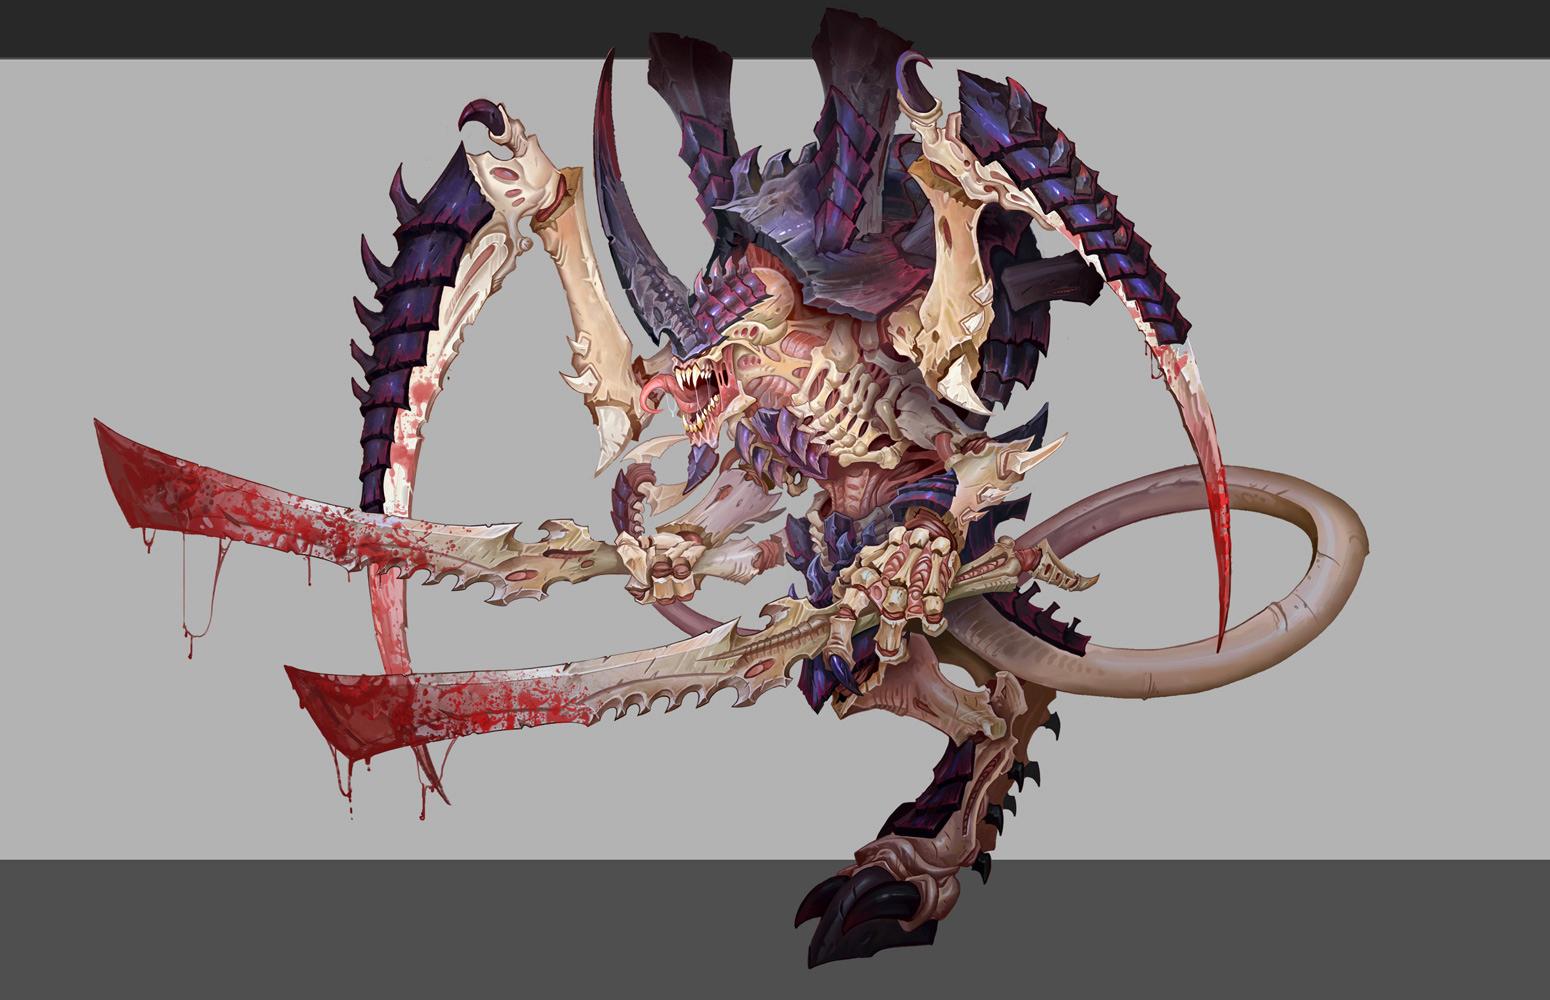 [E3] Eternal Crusade, un MMO Warhammer 40K - Page 3 29